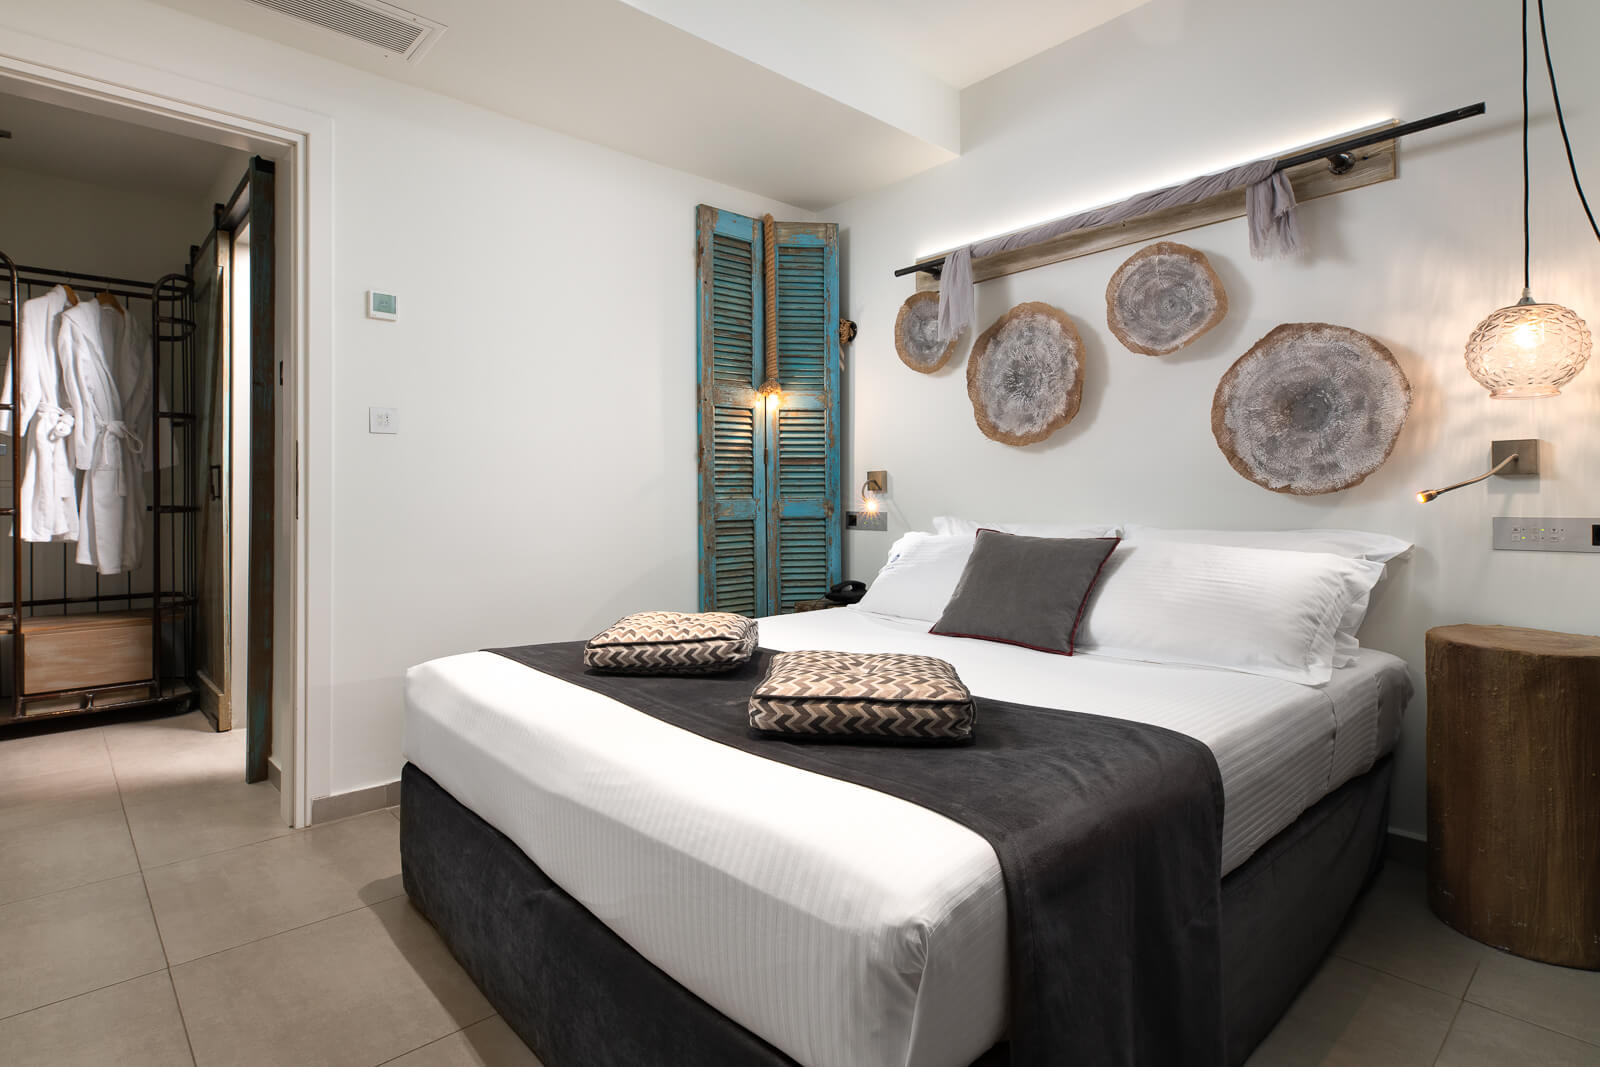 Iviskos-Hotel-Suite-Elakati-Hotel-in-Rhodes